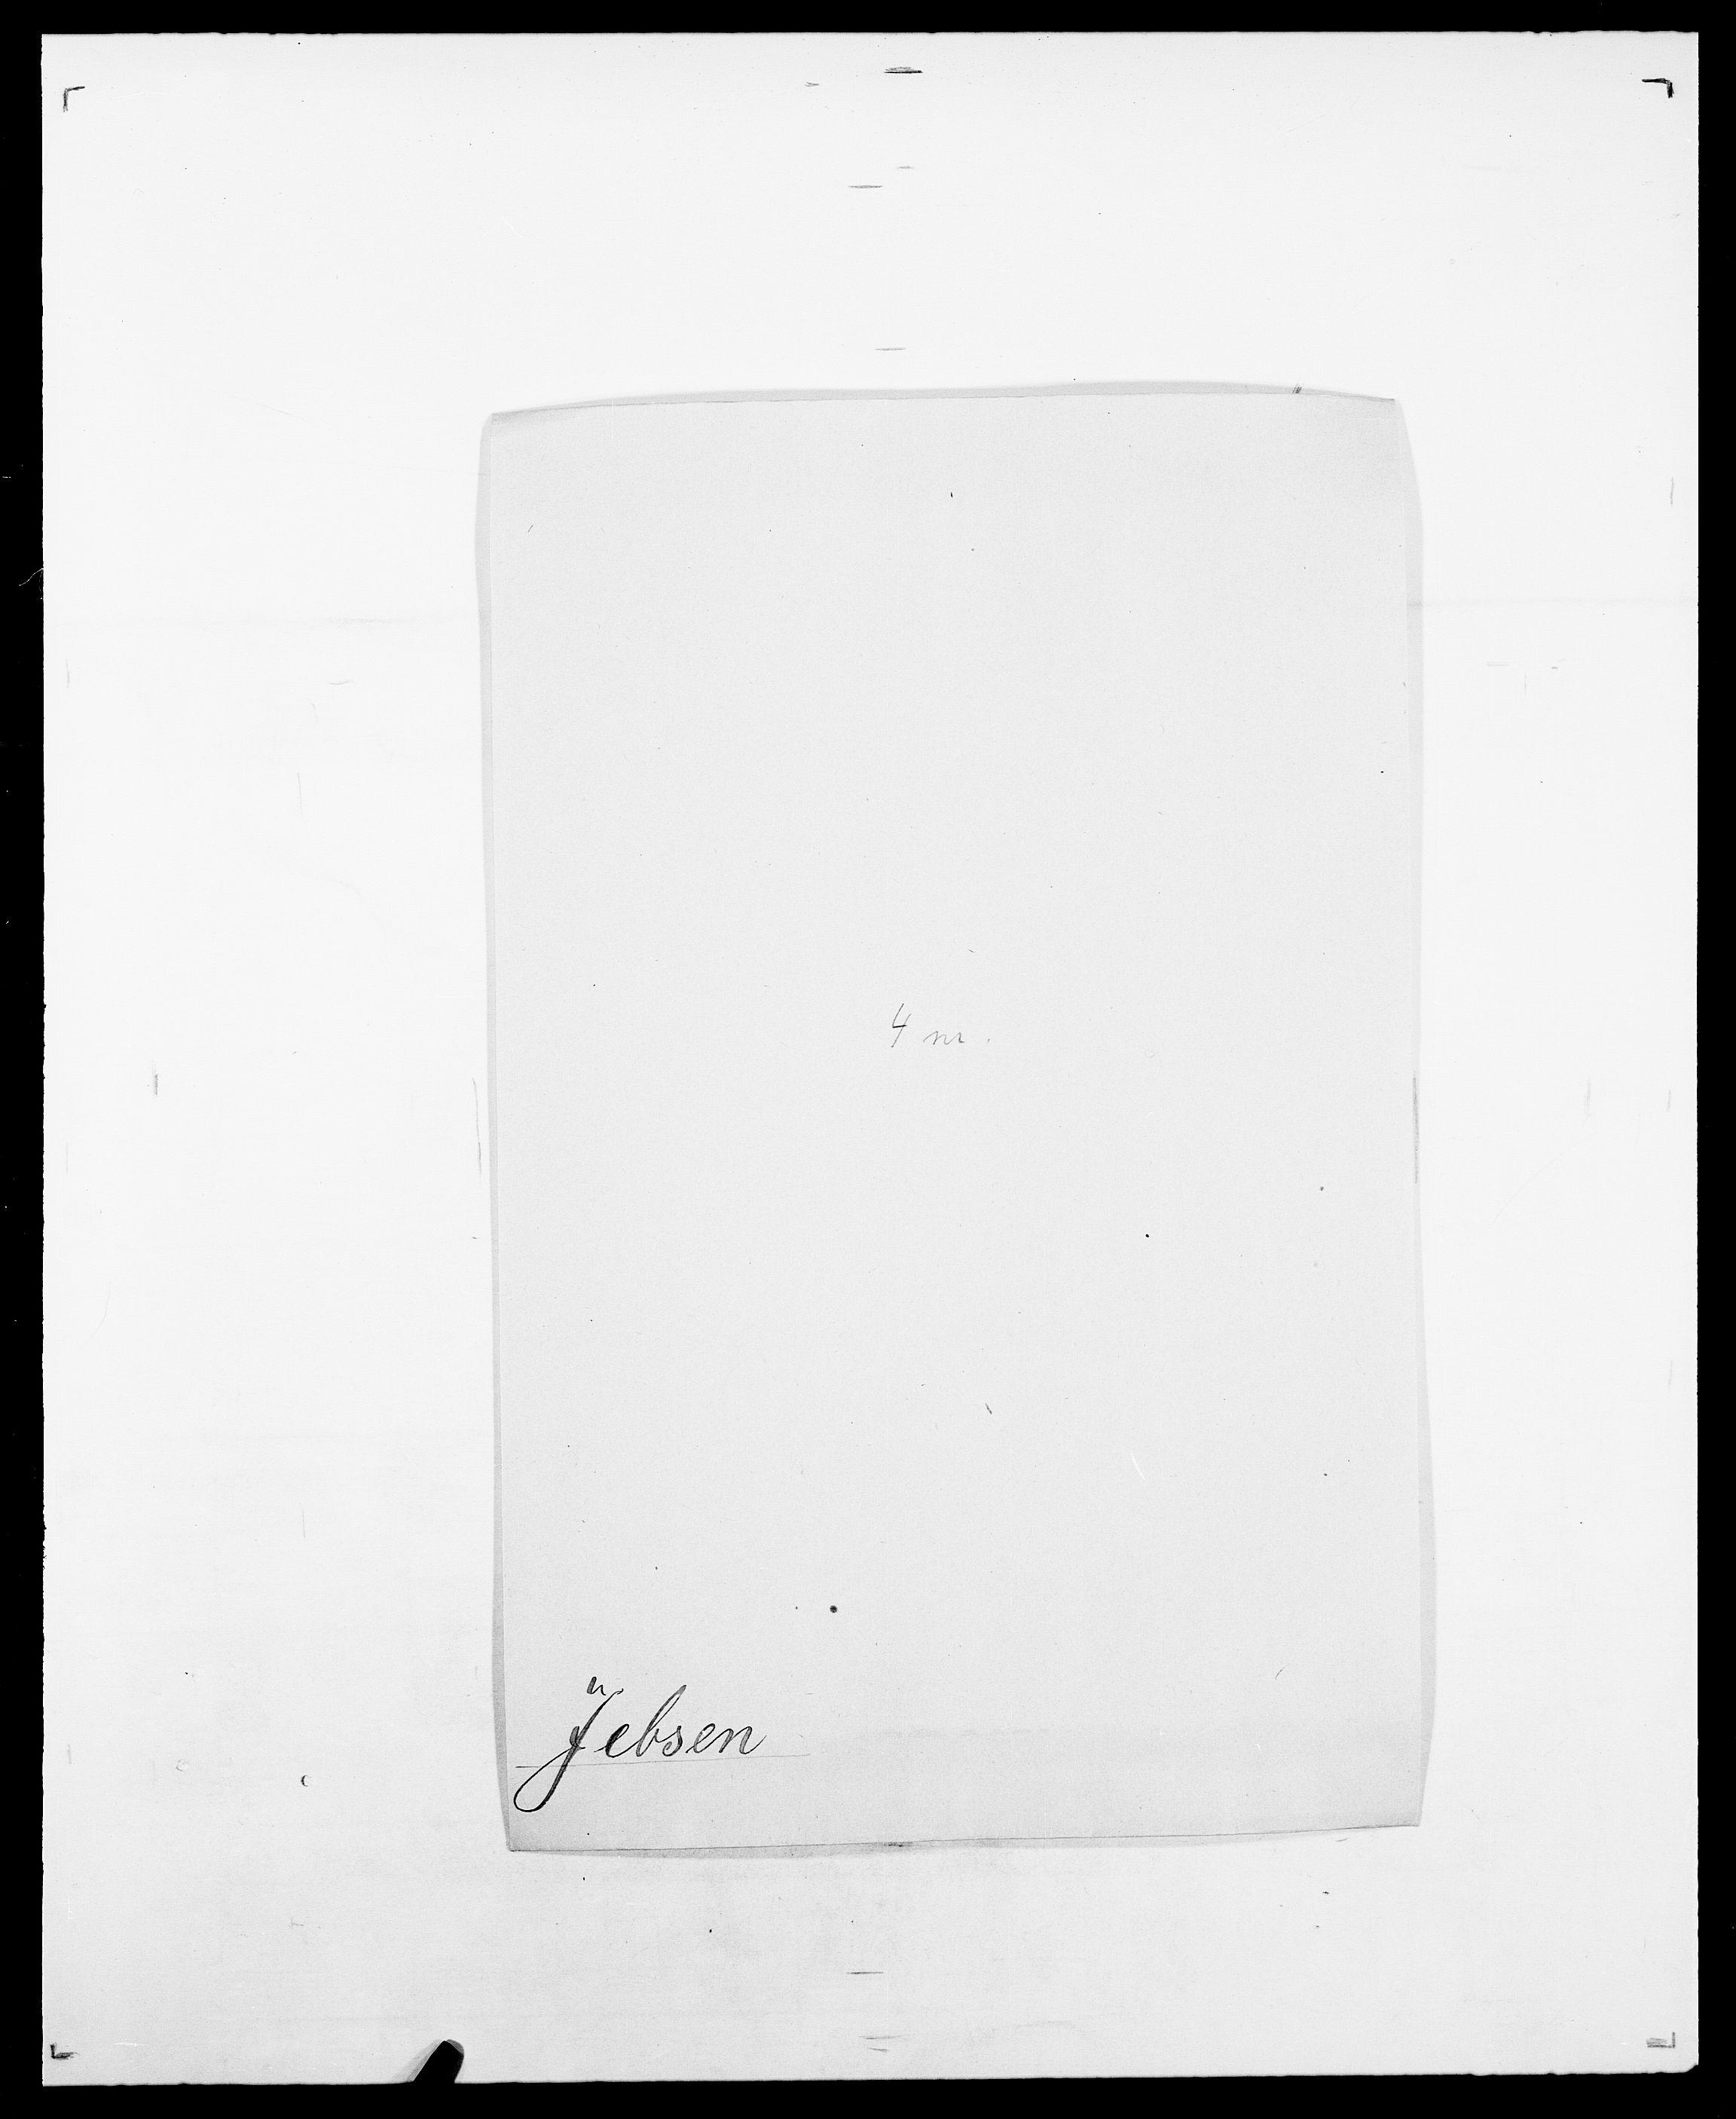 SAO, Delgobe, Charles Antoine - samling, D/Da/L0019: van der Hude - Joys, s. 616